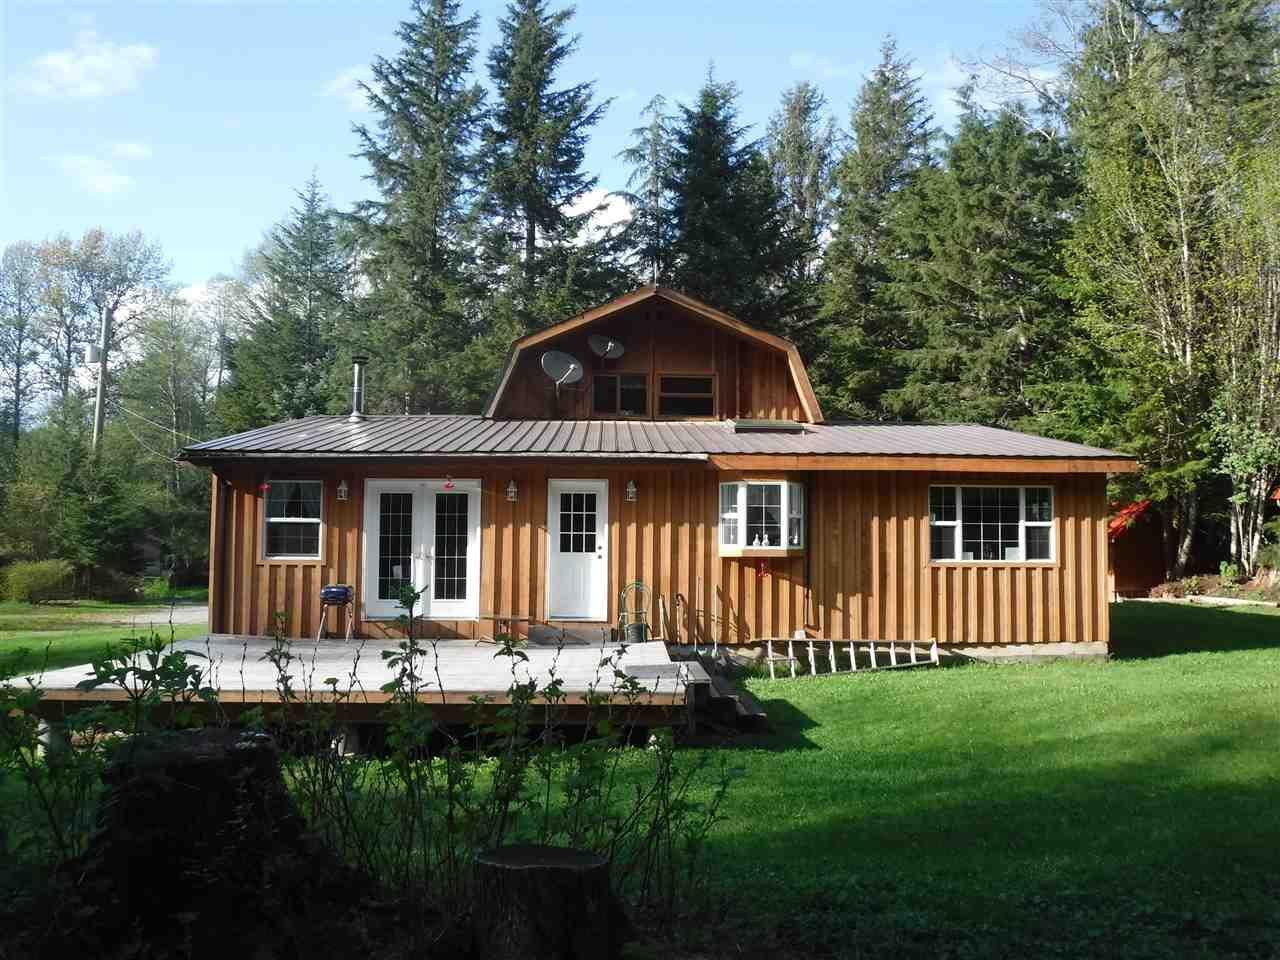 Main Photo: 2275 E MACKENZIE  20 Highway in Bella Coola: Bella Coola/Hagensborg House for sale (Williams Lake (Zone 27))  : MLS®# R2453262